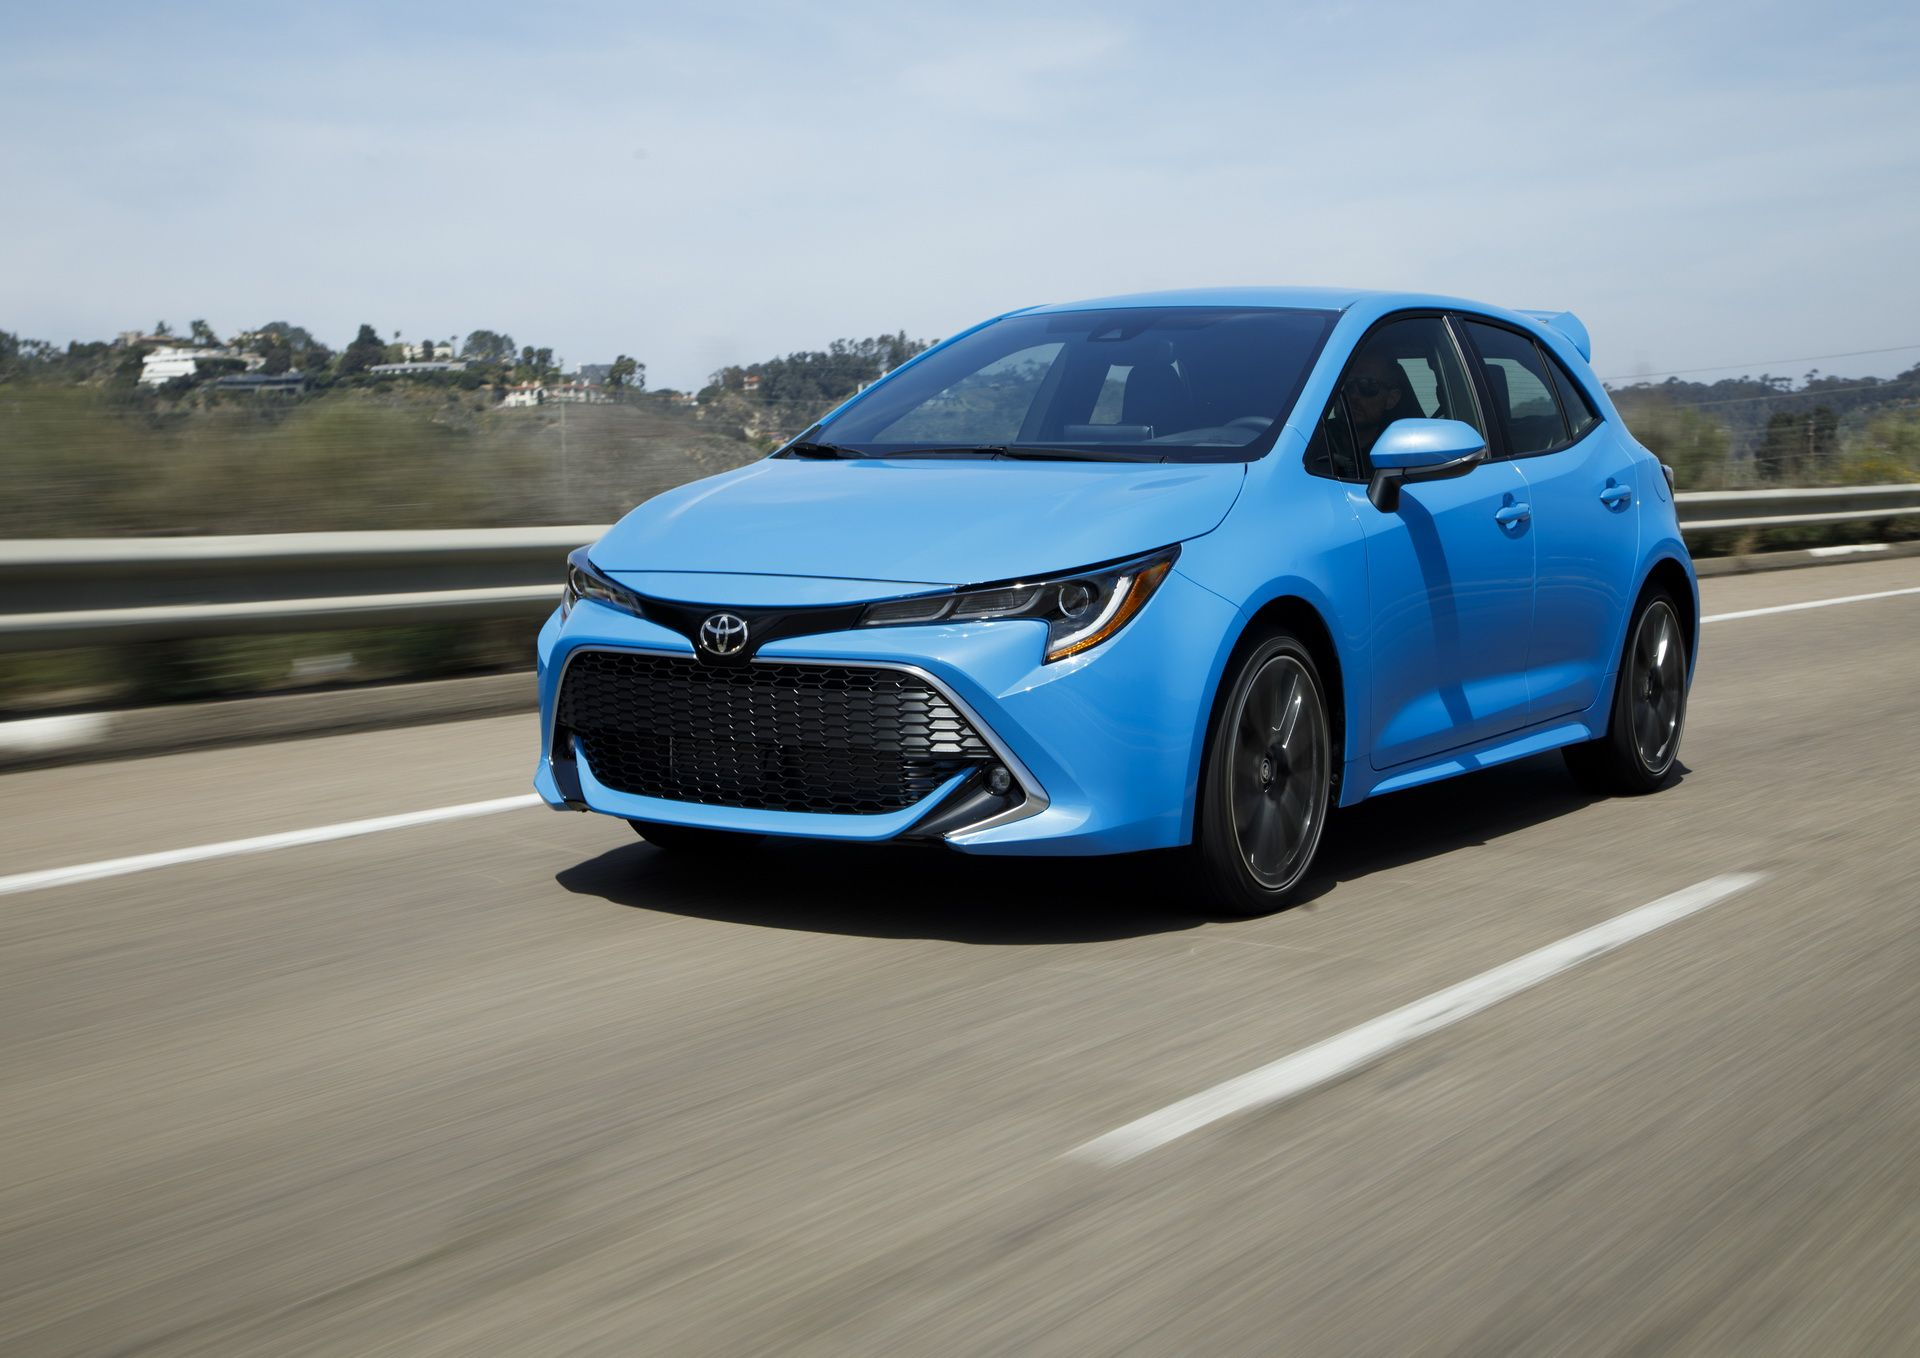 European Auto Parts >> New Toyota Auris Renamed 2019 Toyota Corolla Hatchback ...